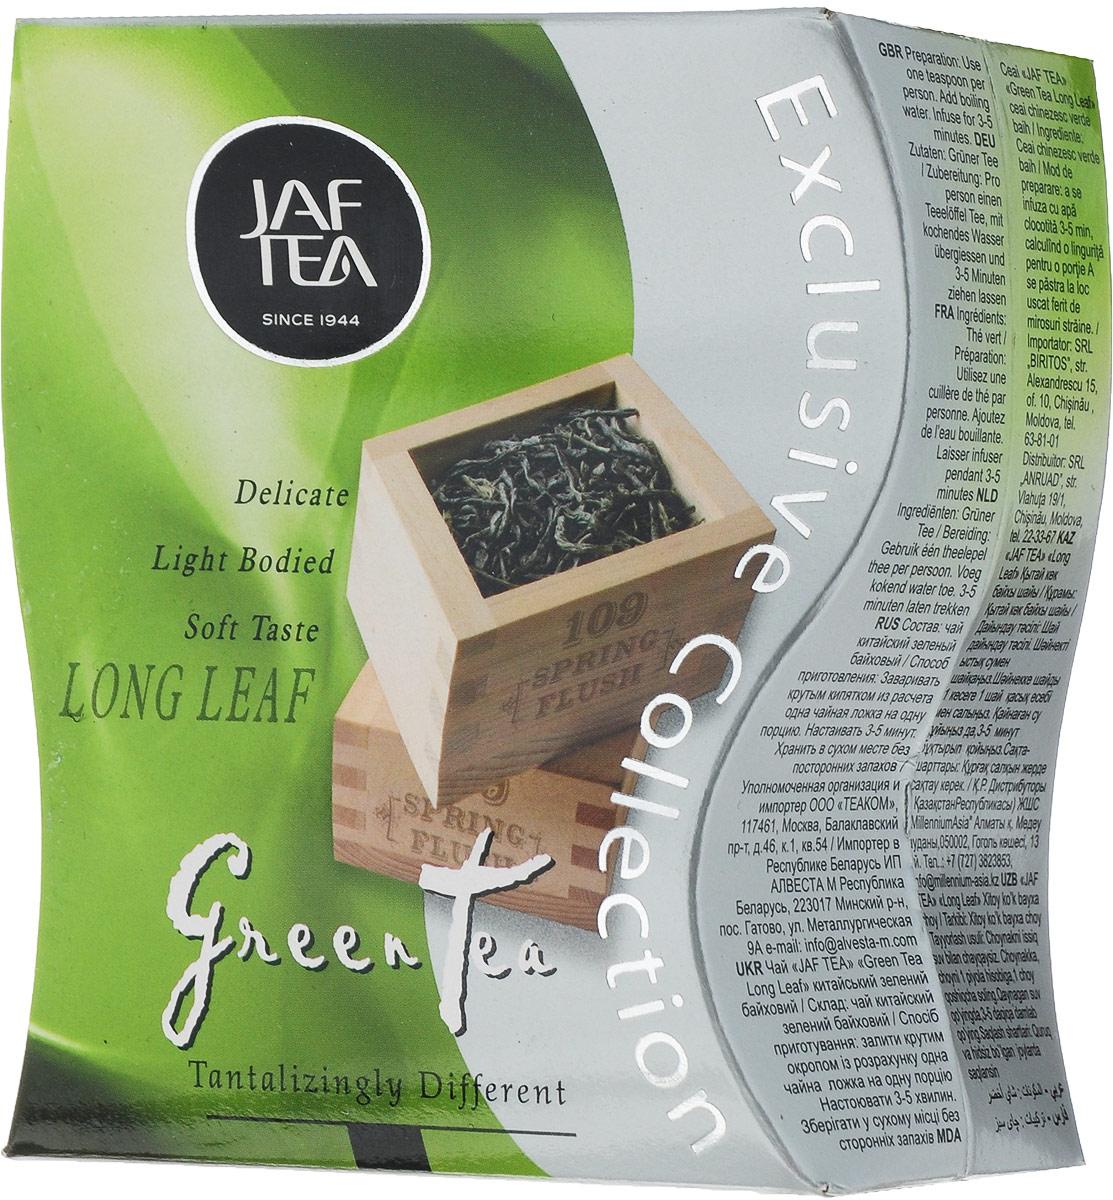 Jaf Tea Long Leaf чай зеленый листовой, 100 г 2008 год yunnan puer cake shu pu er 100g old long yu ripe puerh tea aroma sweet taste китайский чай pc30 aged puerh best o